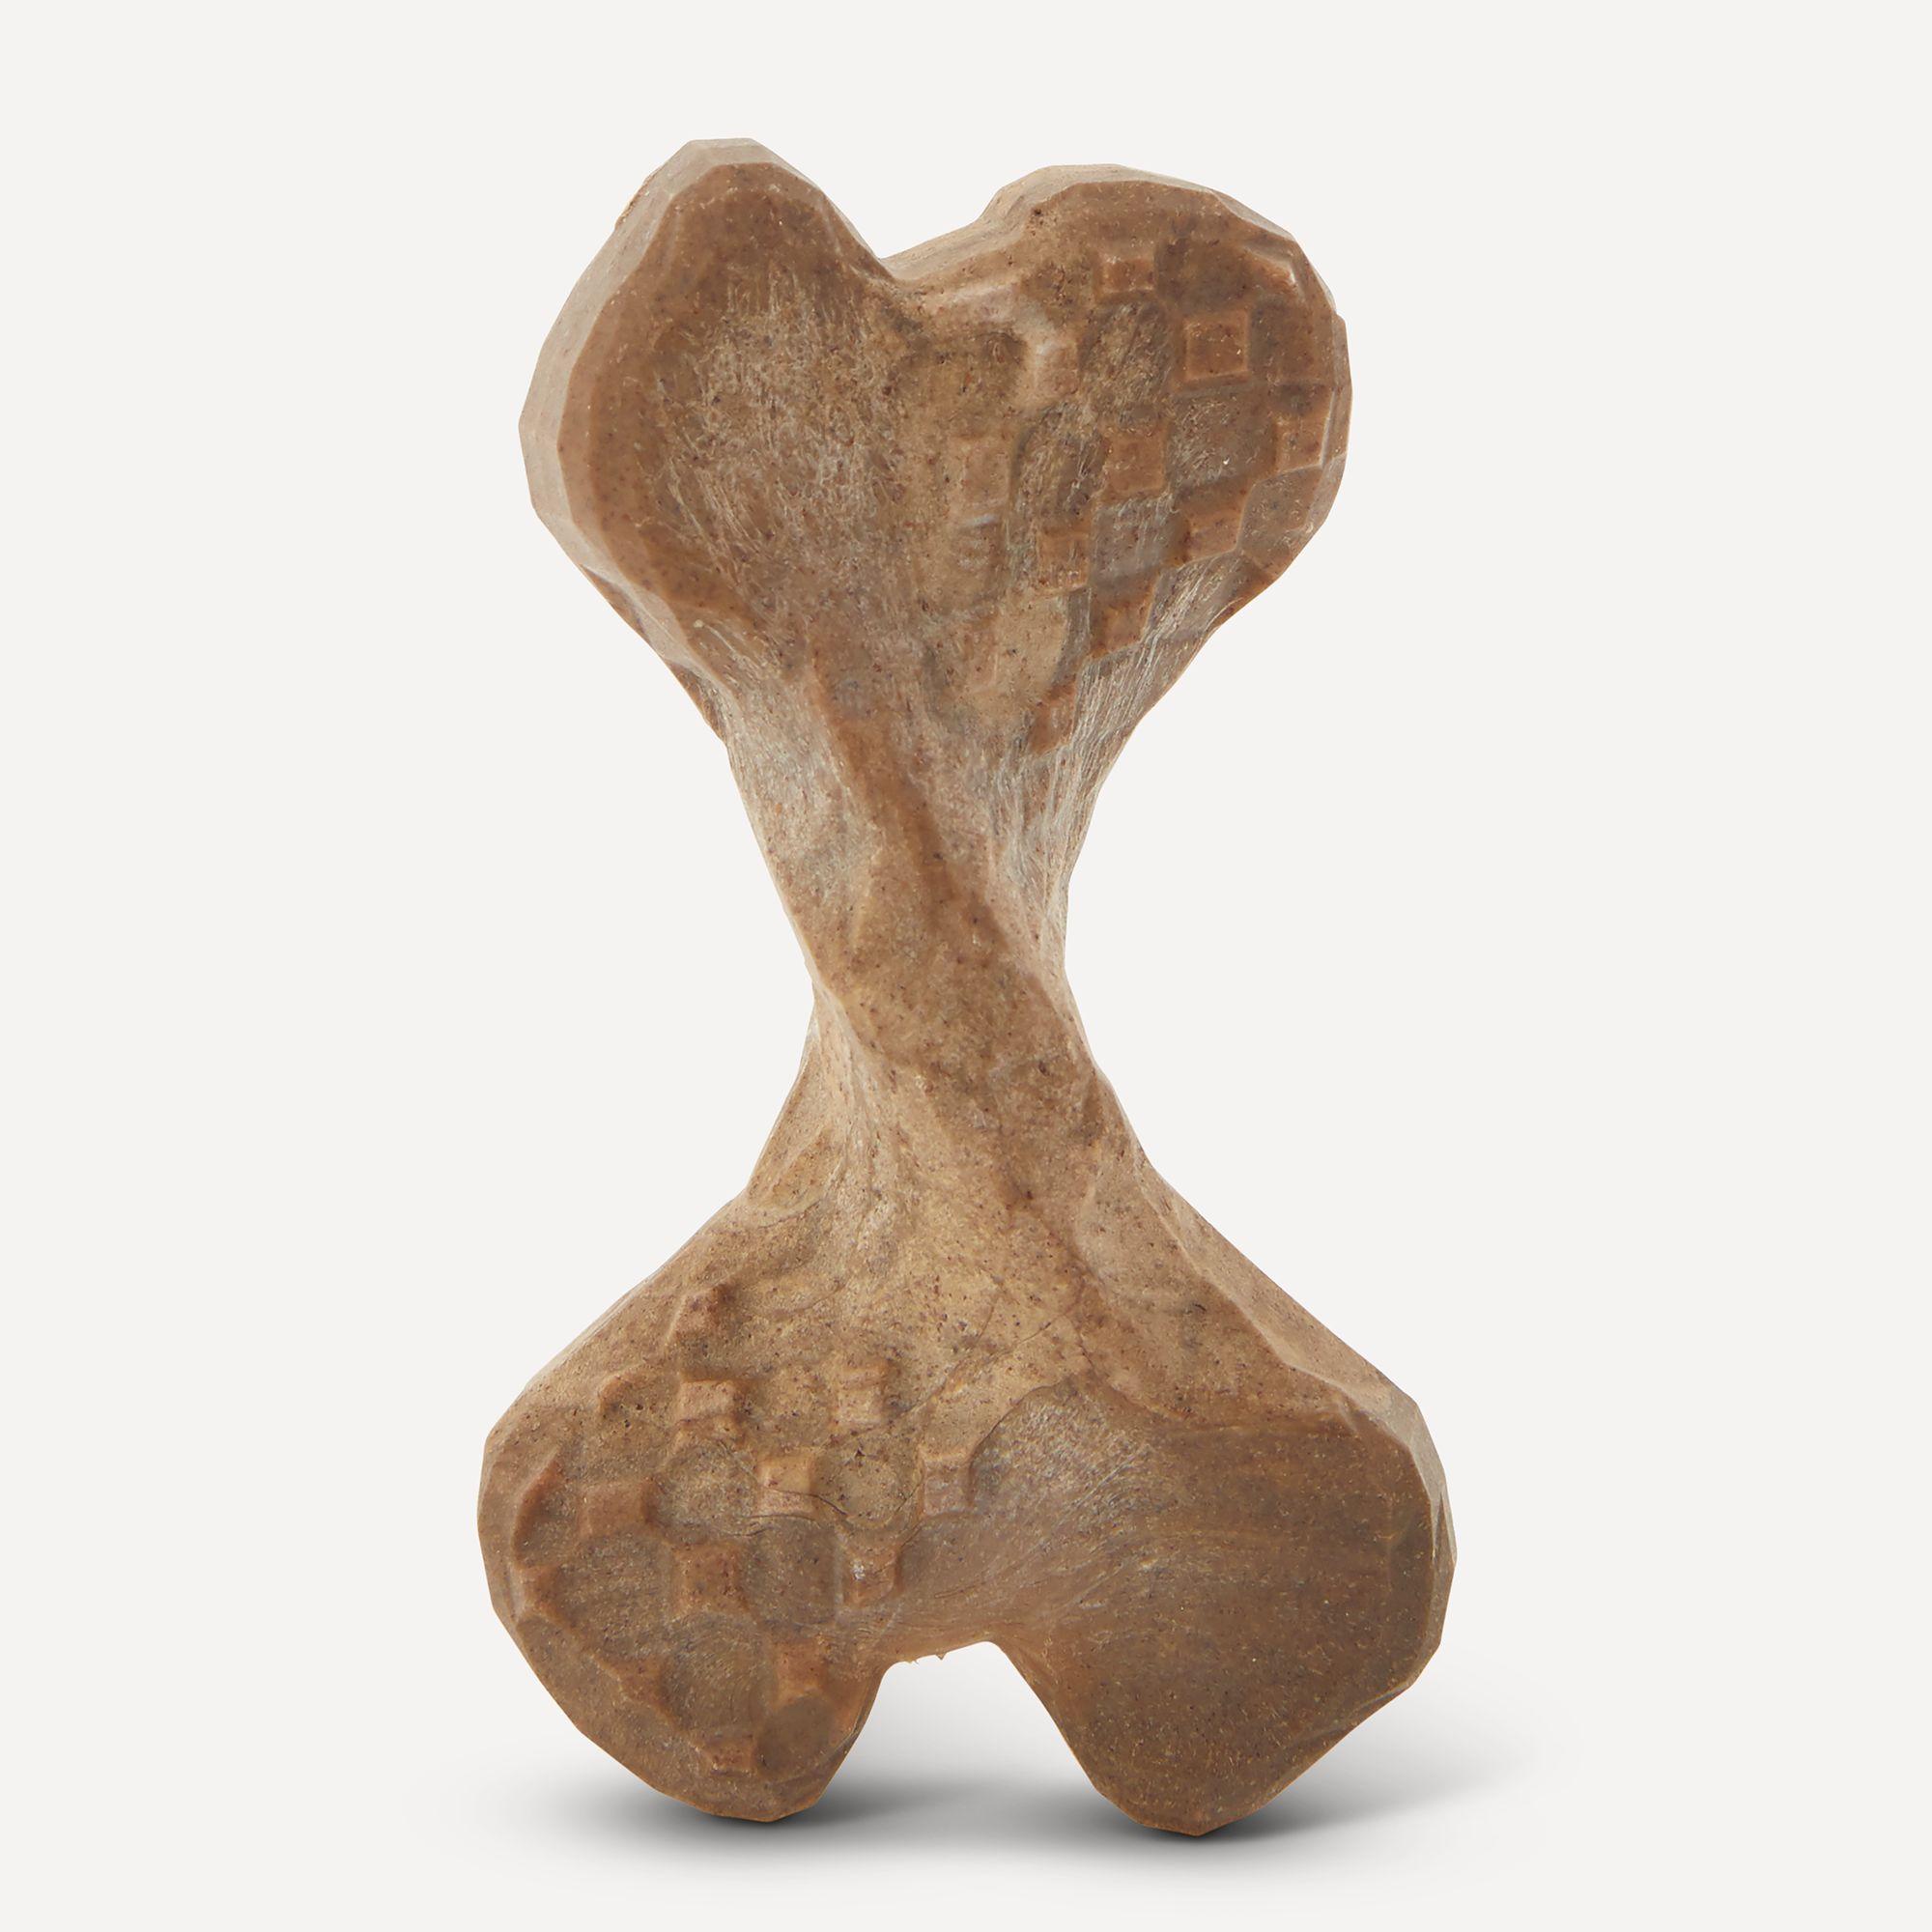 Boss Bones Trade Twist Puppy Chew Toy